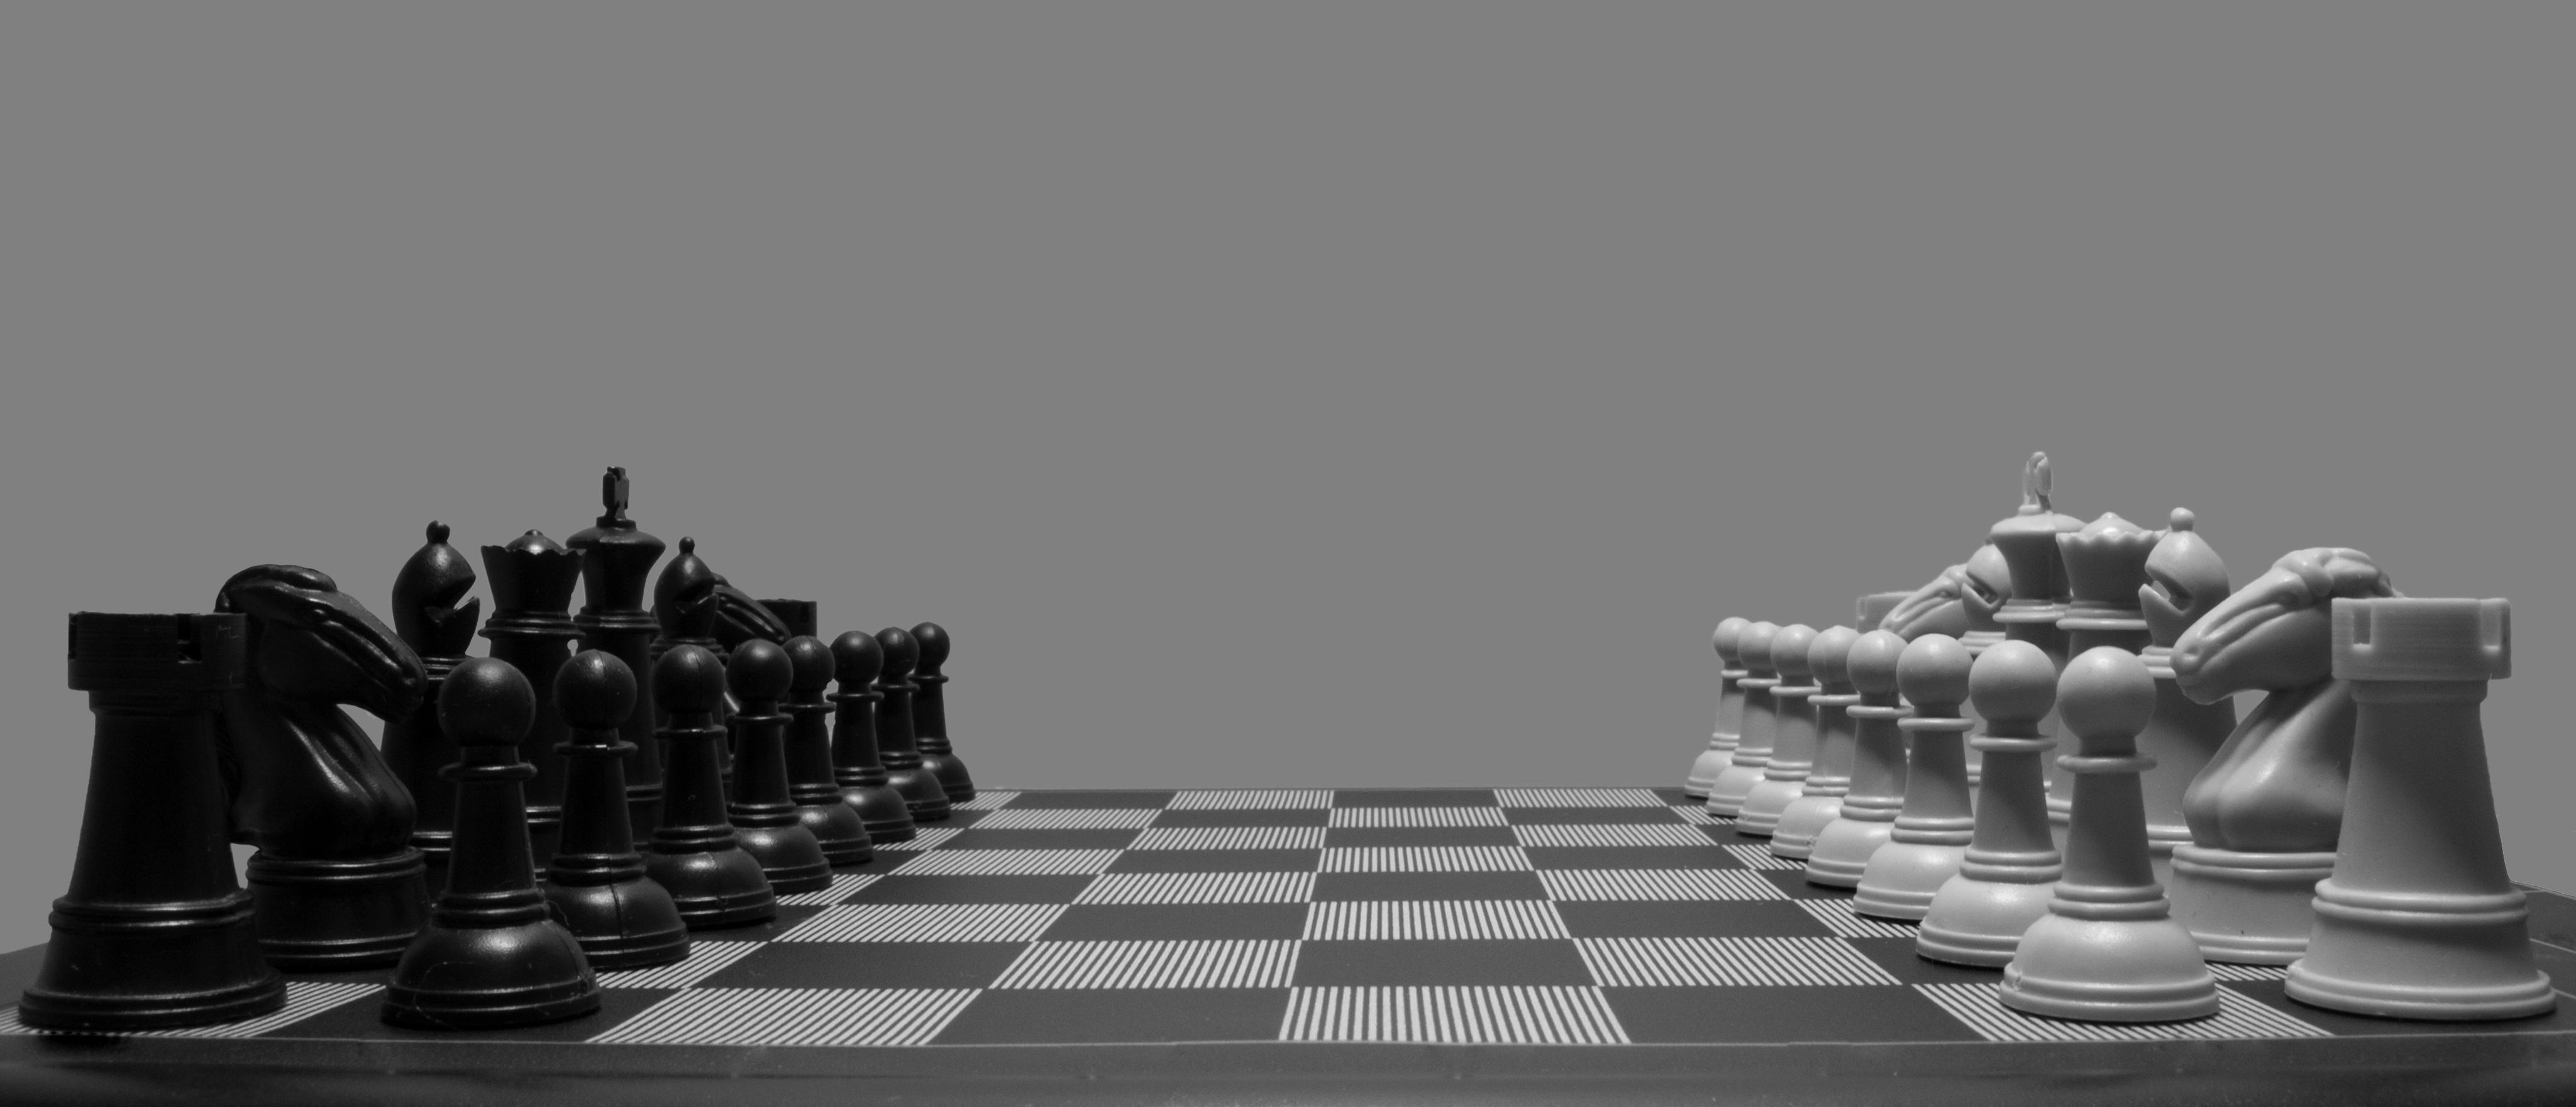 d26fc078bc08 μαύρο και άσπρο παιχνίδι αναψυχή μονόχρωμος επιτραπέζιο παιχνίδι Αθλητισμός  σκάκι σκακιέρα Παιχνίδια πιόνια μονόχρωμη φωτογραφία εσωτερικού